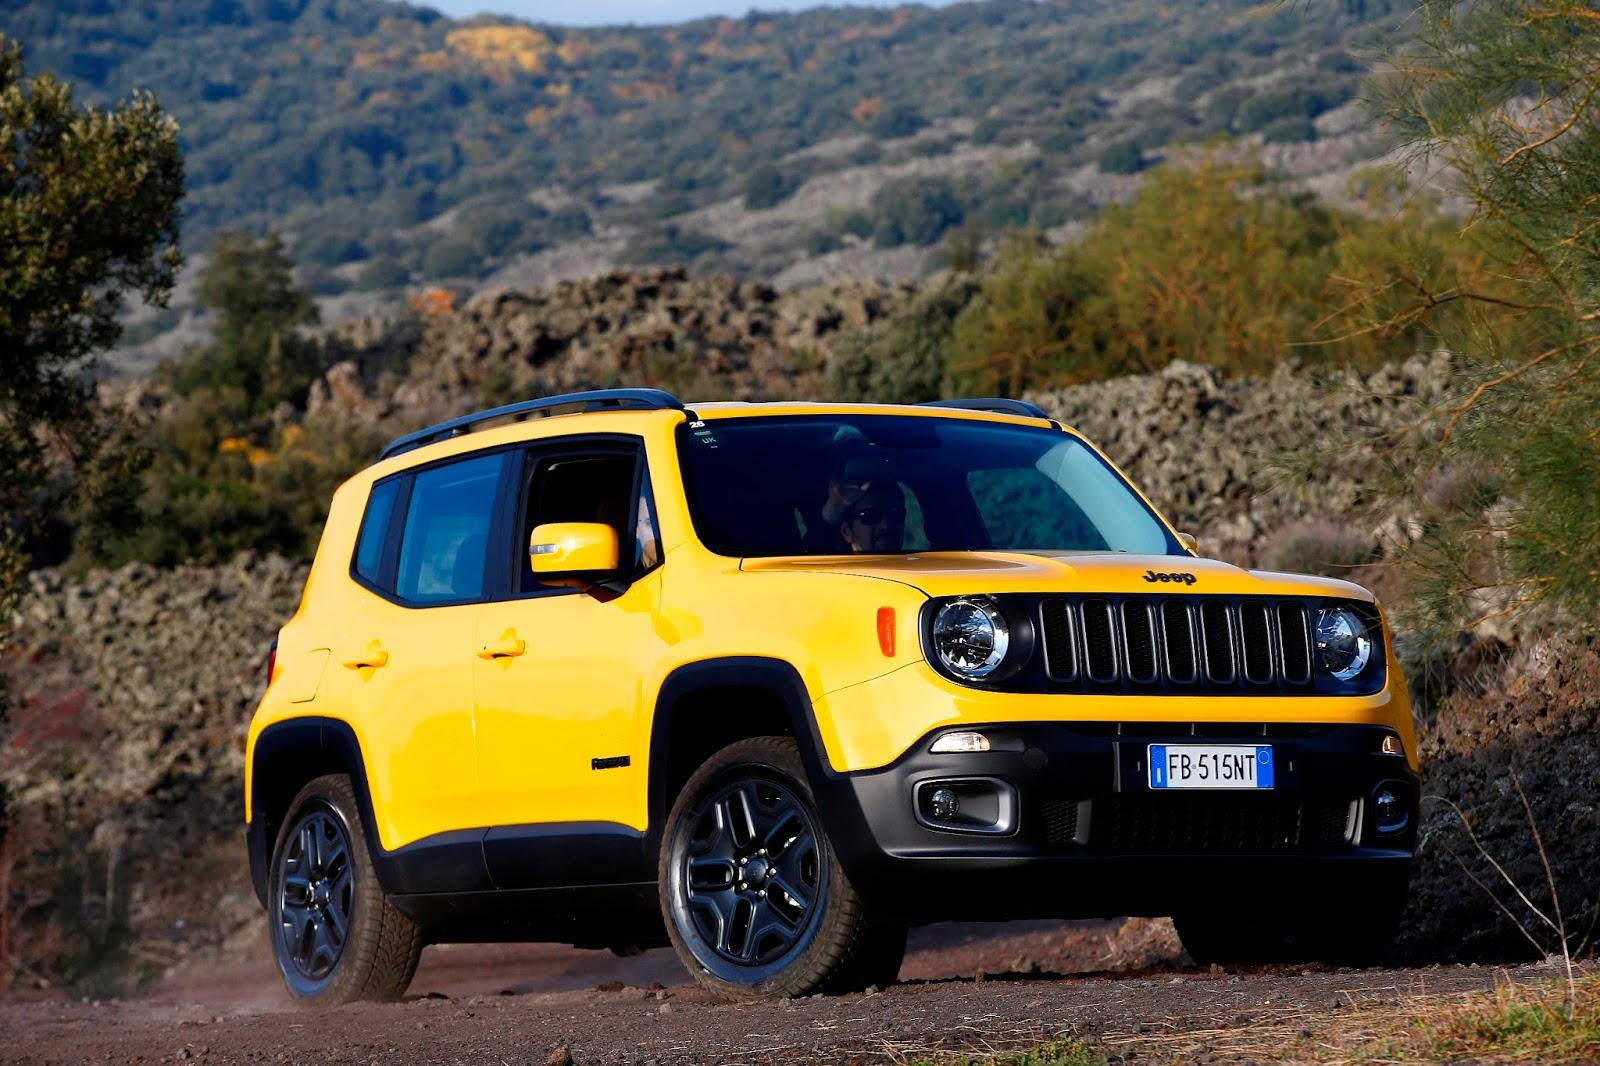 Jeep Renegade2Bphoto2B Σαρώνει σε πωλήσεις το Renegade compact SUV, Jeep, Jeep Renegade, Sales, SUV, videos, zblog, πωλήσεις